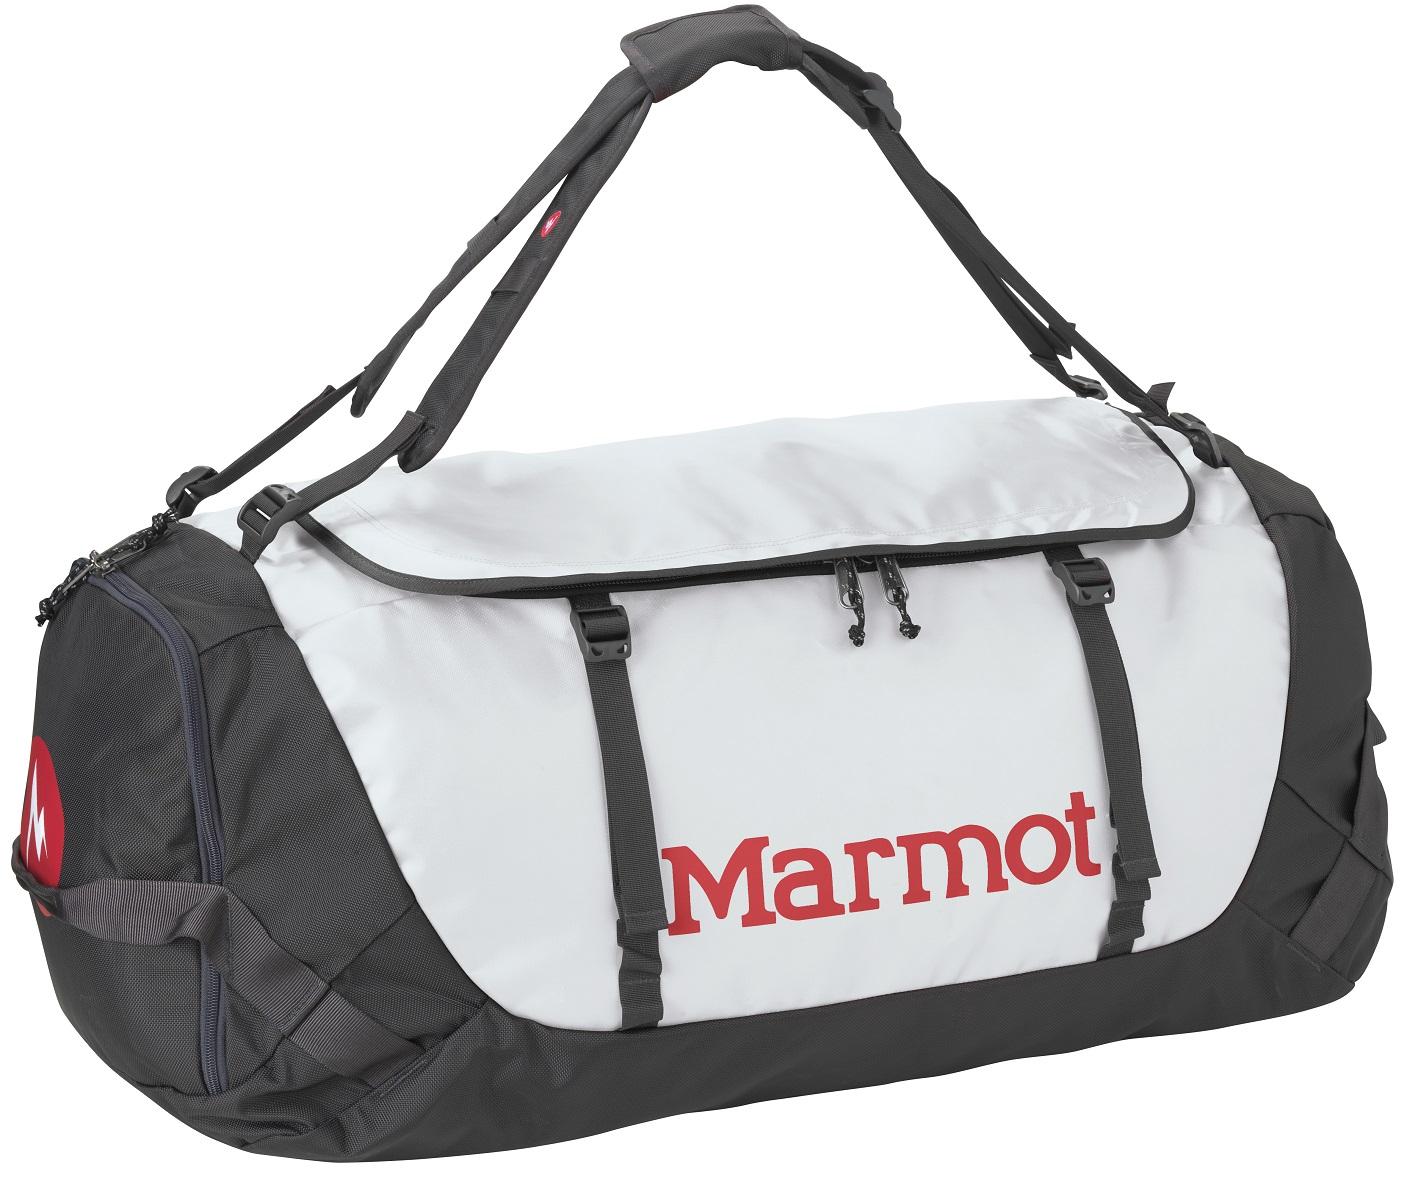 Сумка дорожная Marmot Long Hauler Duffel Bag Large, цвет: серый, 75 л25150-1230-L